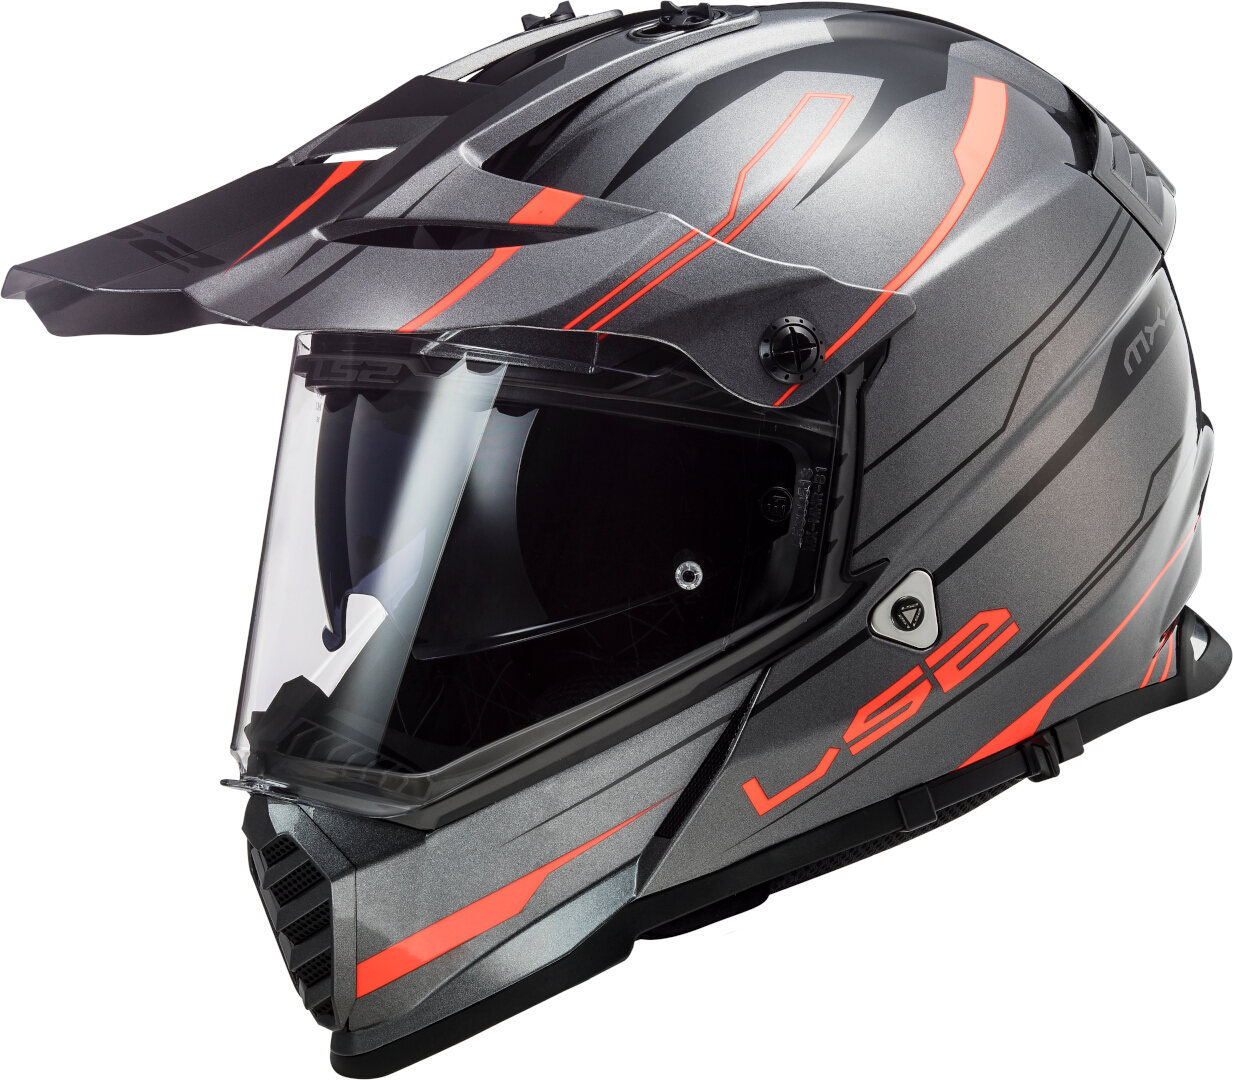 LS2 MX436 Pioneer Evo Knight Motocross Helm, grau-orange, Größe L, grau-orange, Größe L